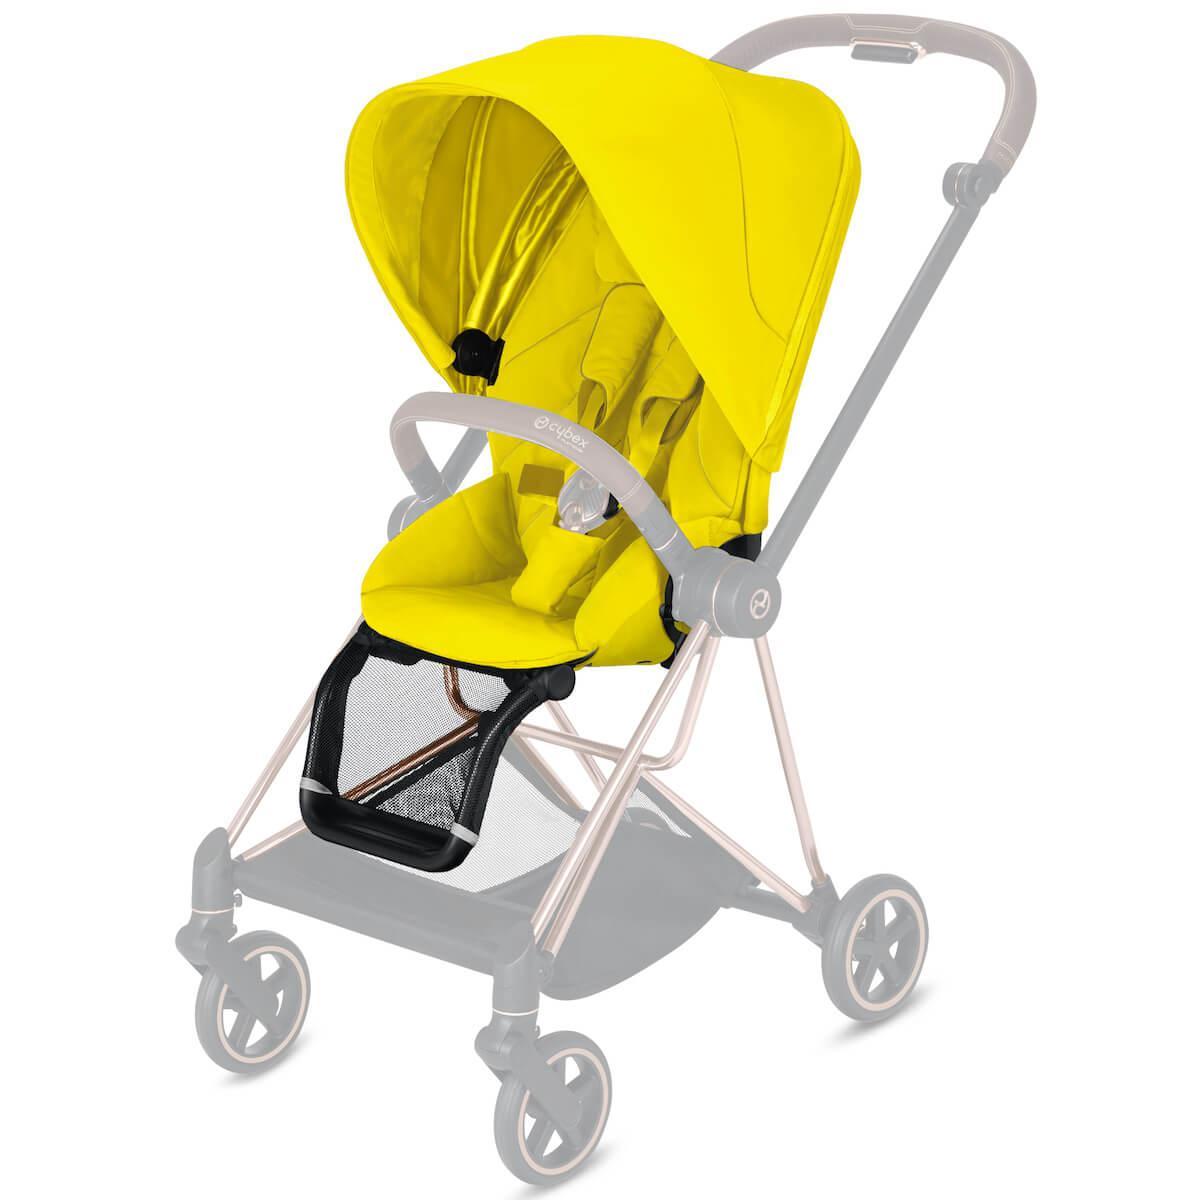 Seat Pack MIOS Cybex Mustard Yellow